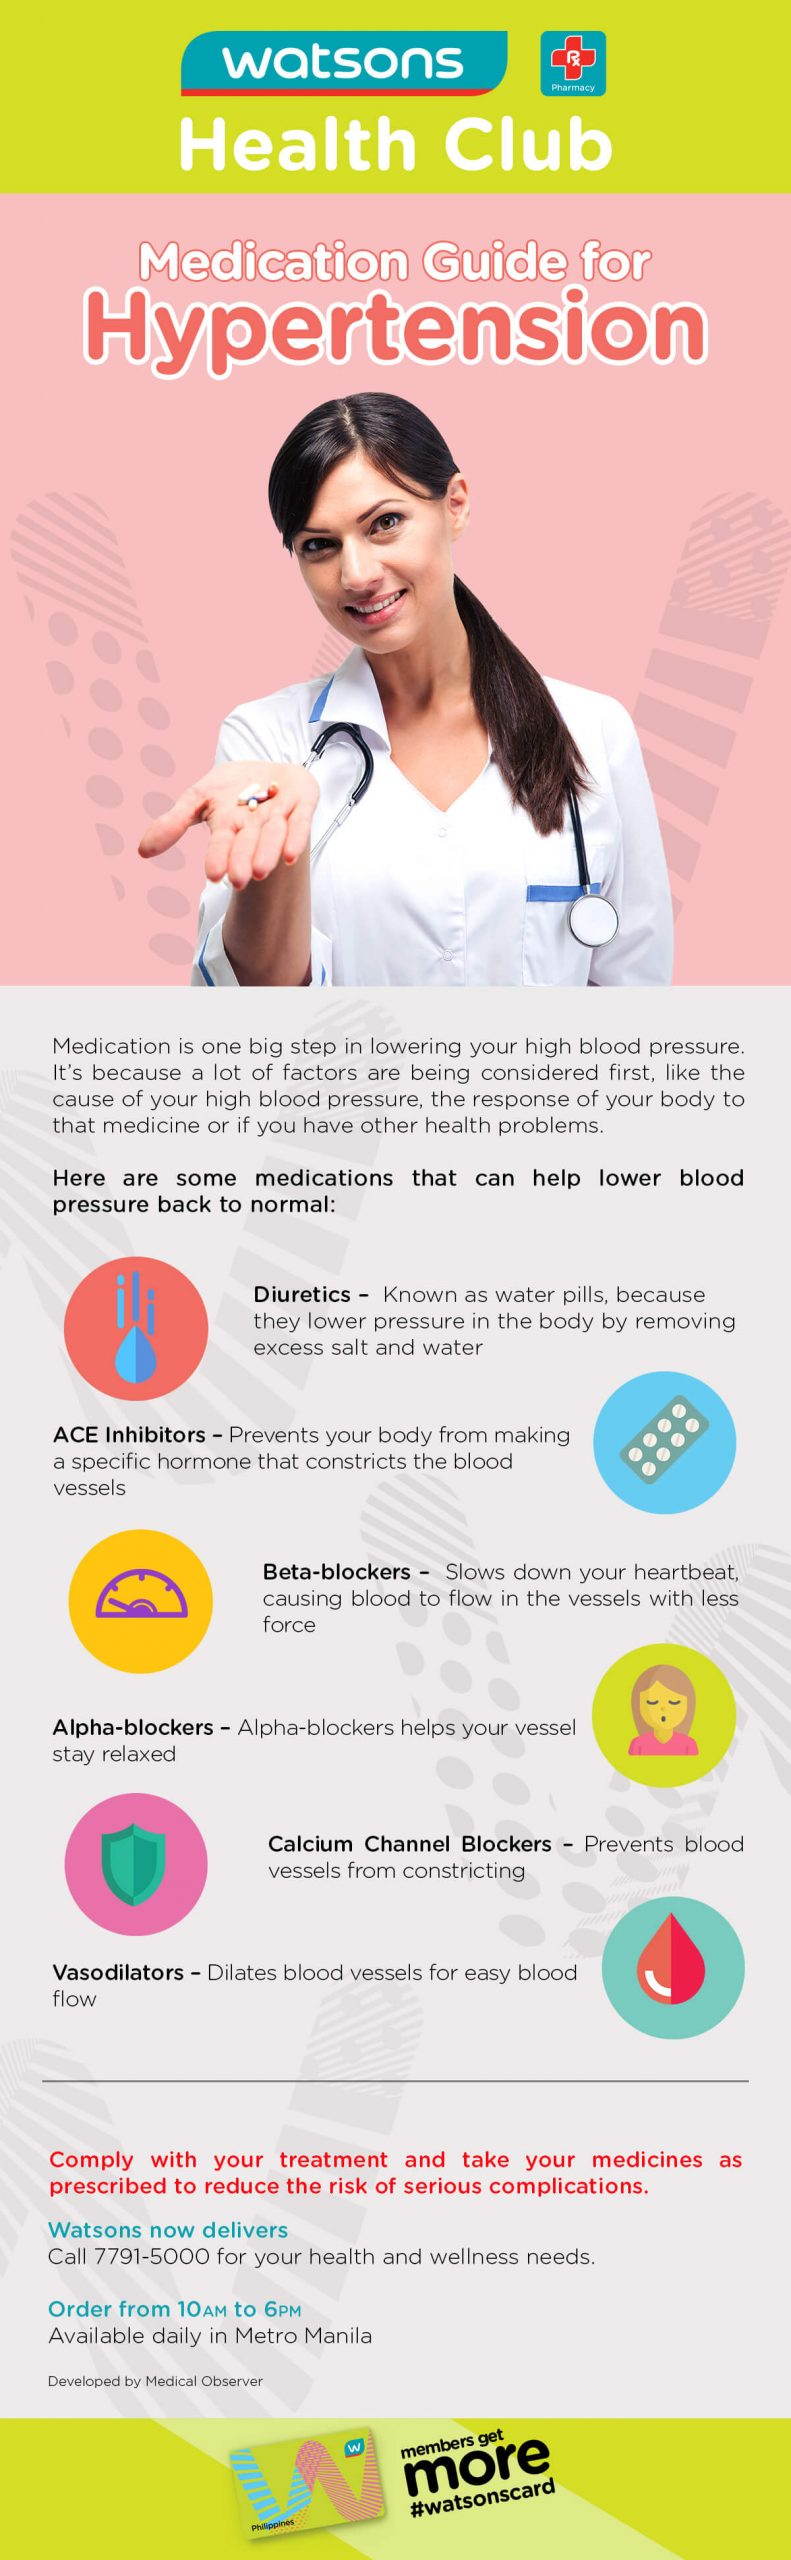 Medication Guide For Hypertension